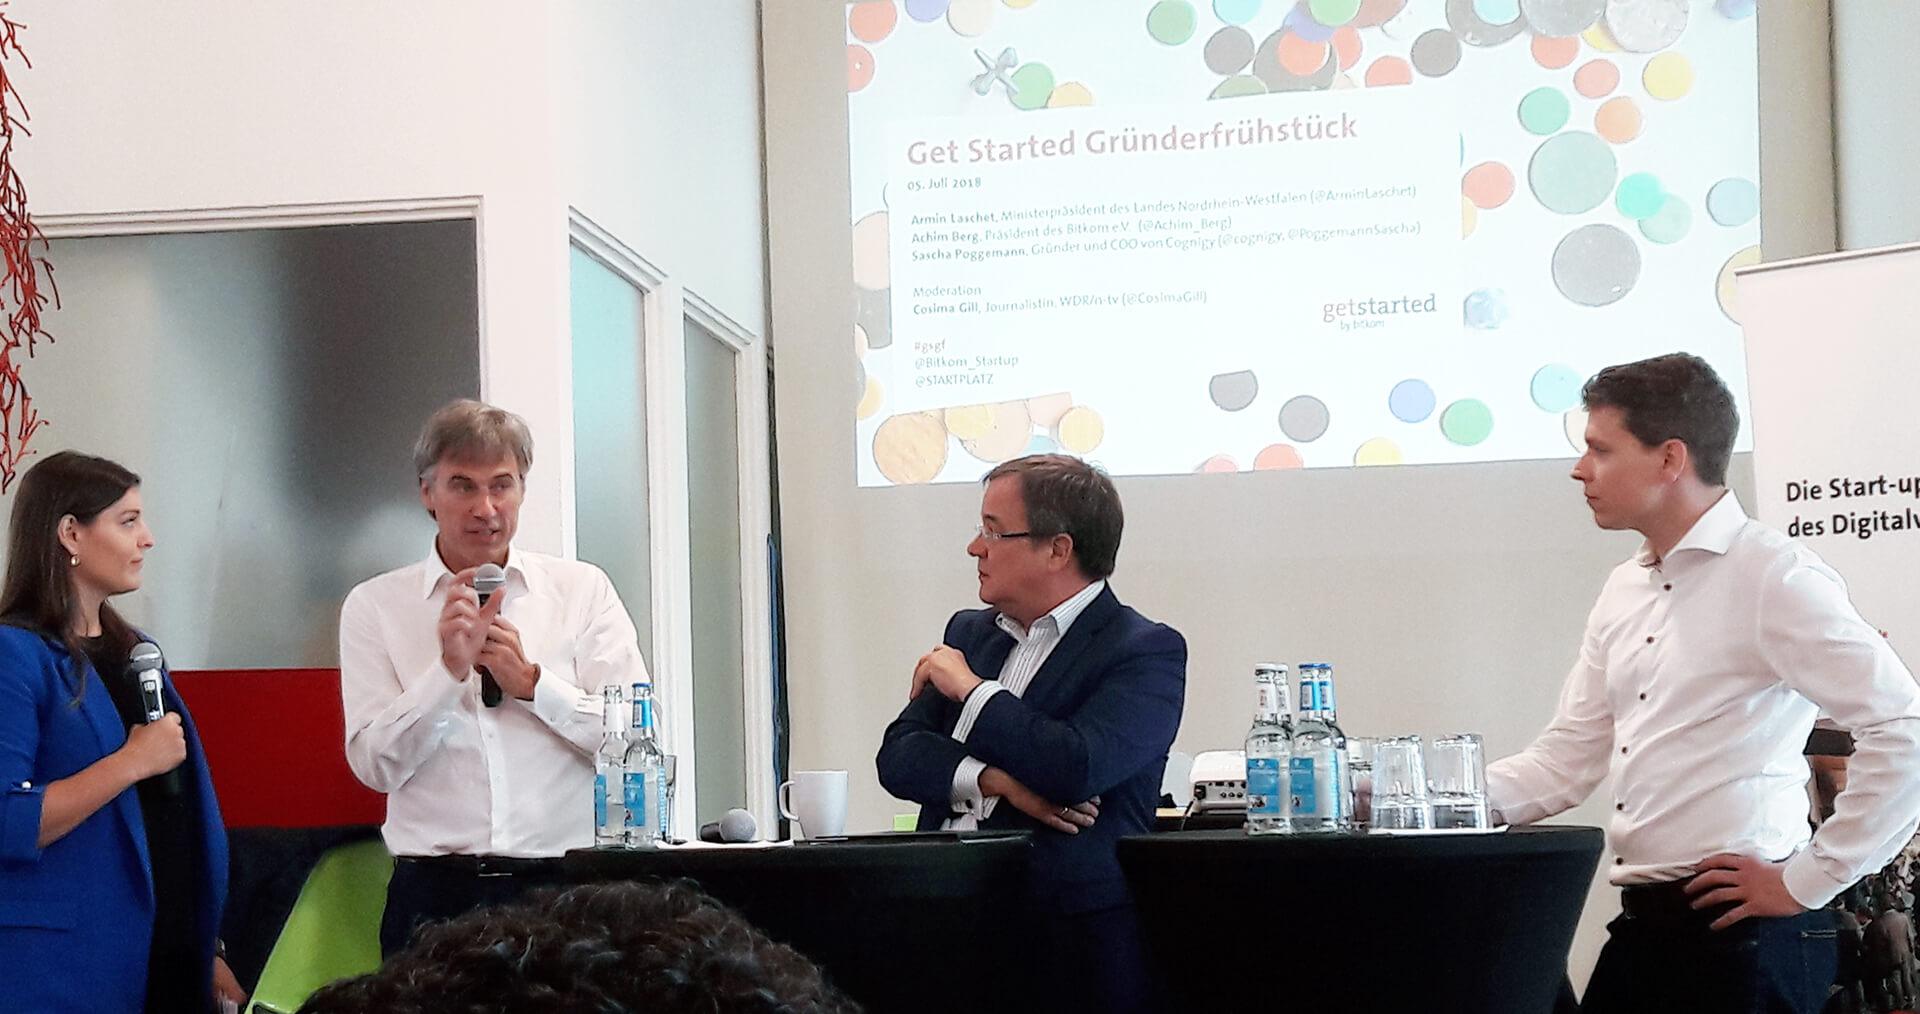 Gründerfrühstück mit Ministerpräsident Armin Laschet